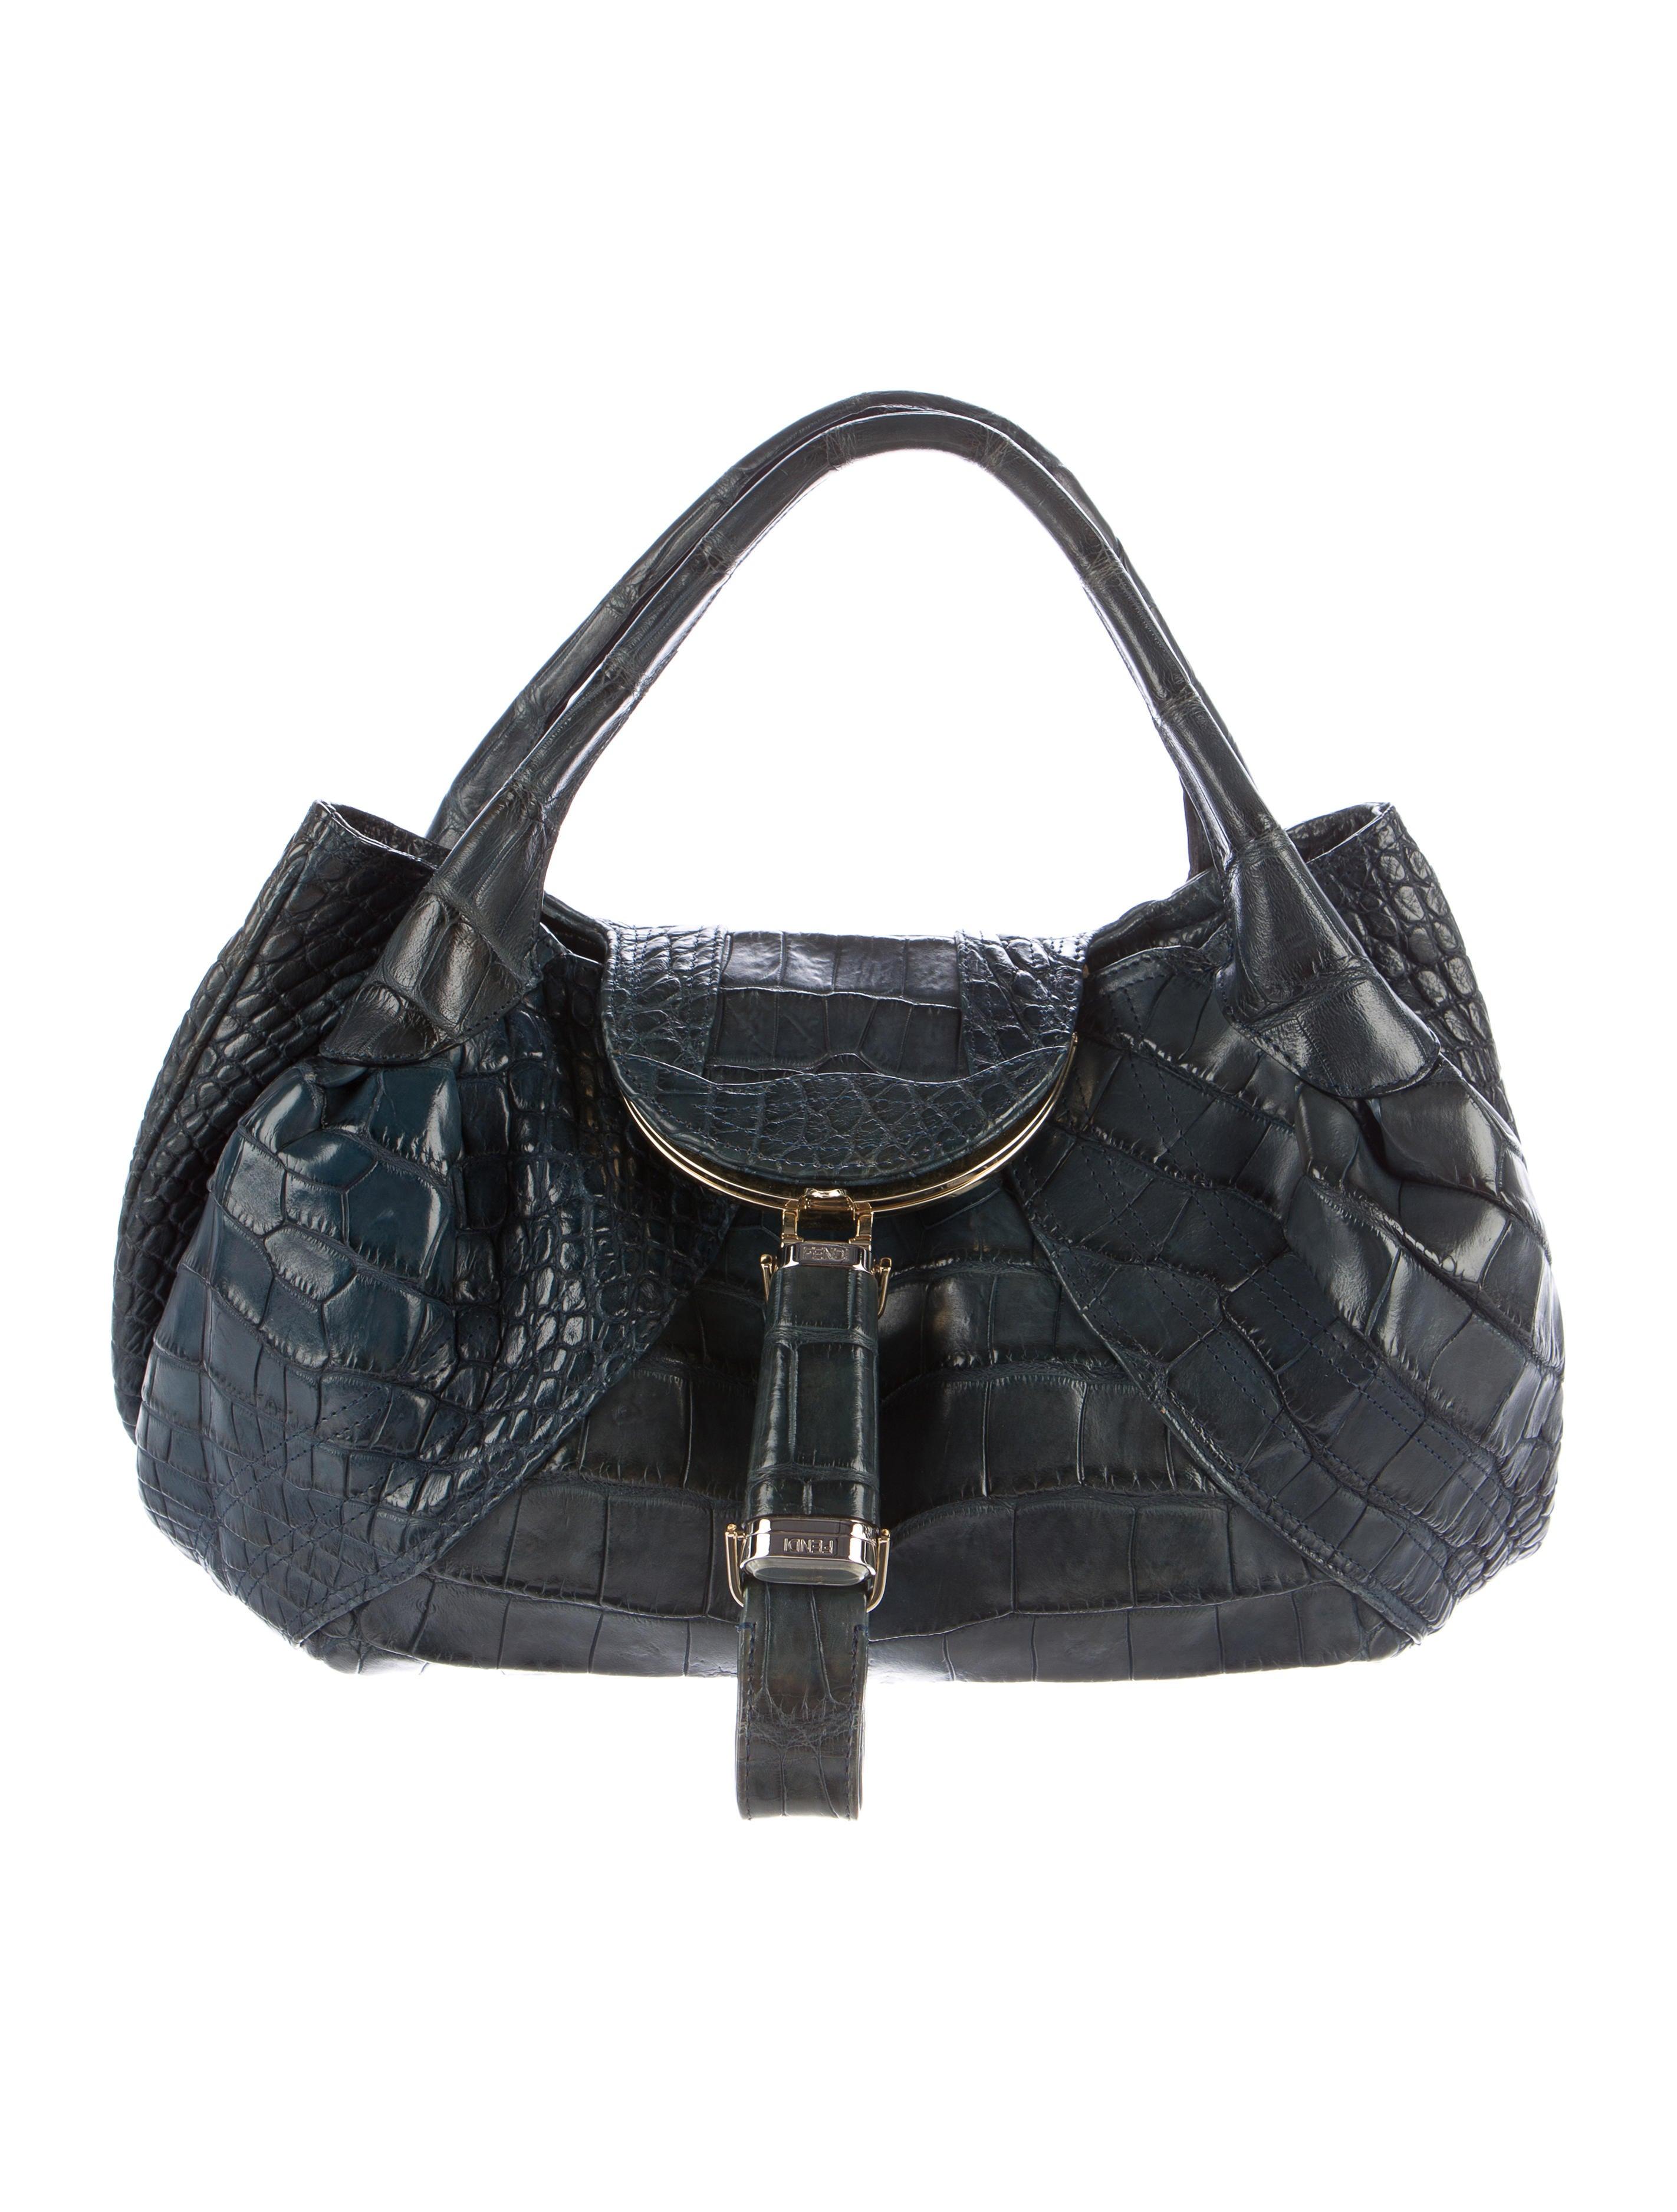 97caaaefdf66 Fendi Alligator Spy Bag - Handbags - FEN51357